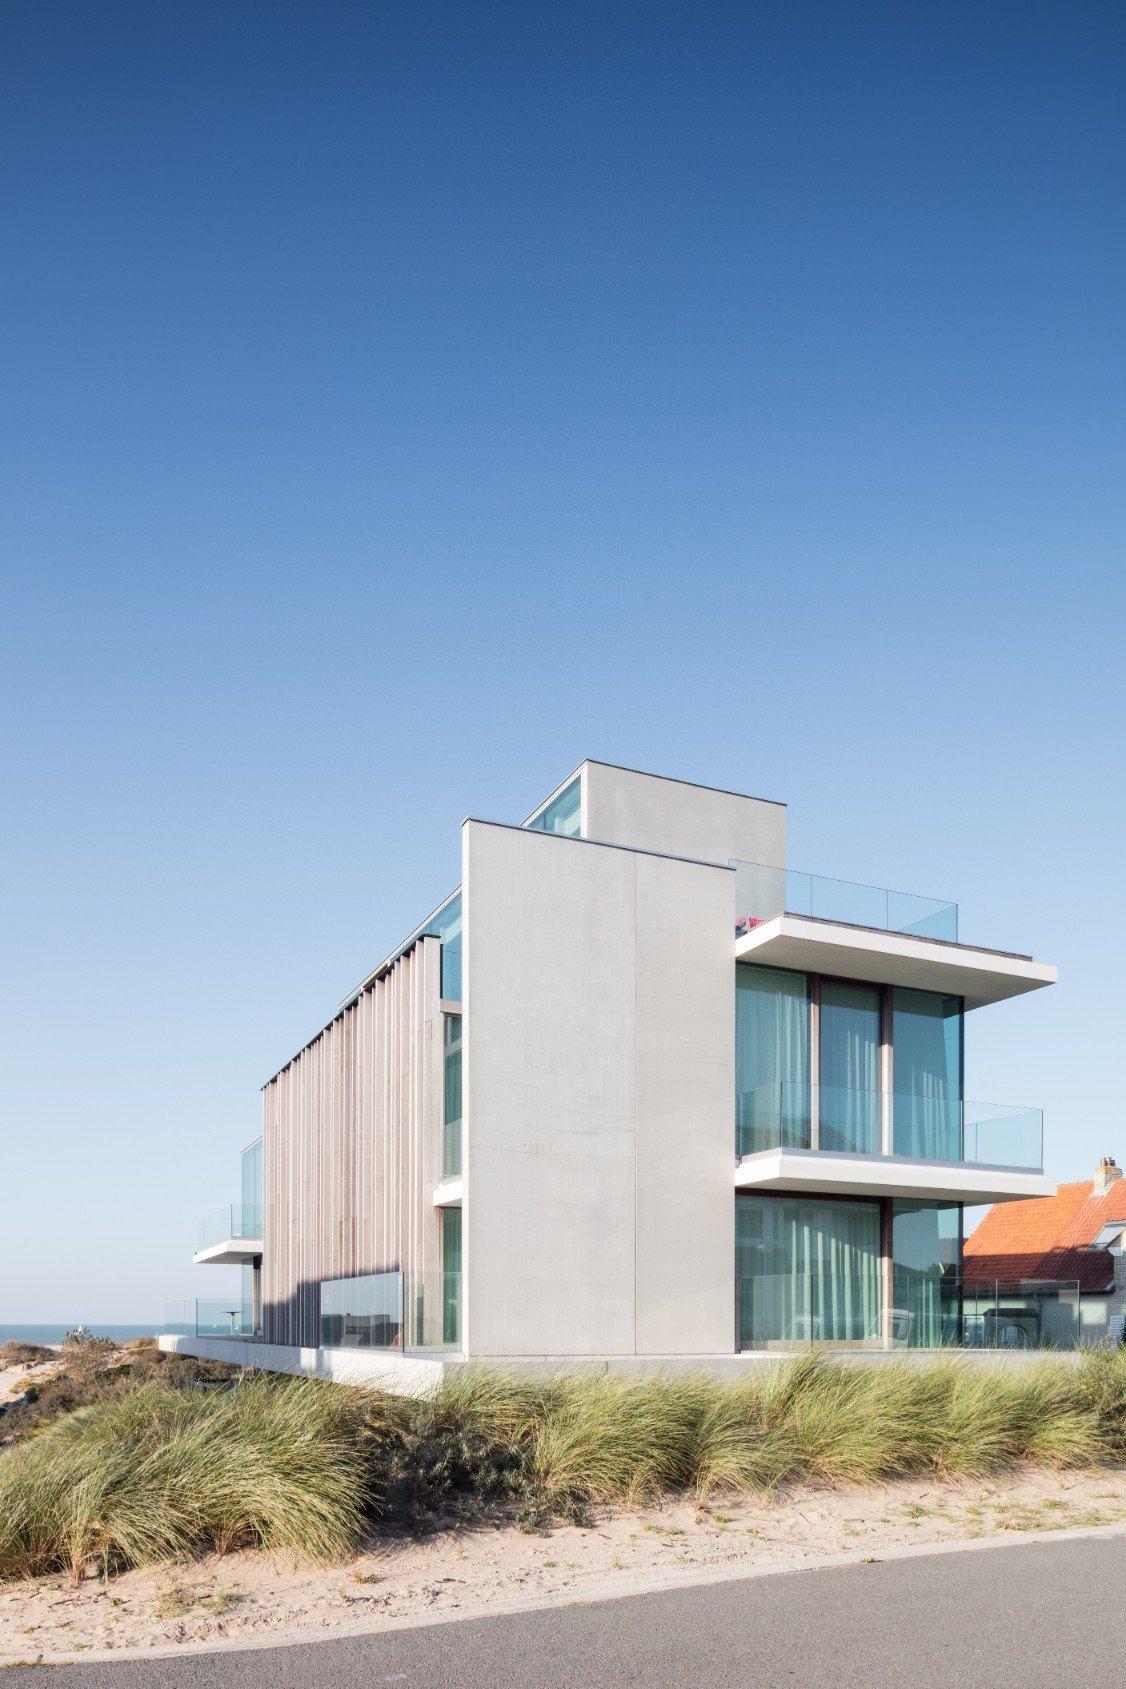 Rietveldprojects-Residence-ON-appartement-design-architectuur-kust-tvdv4.jpg